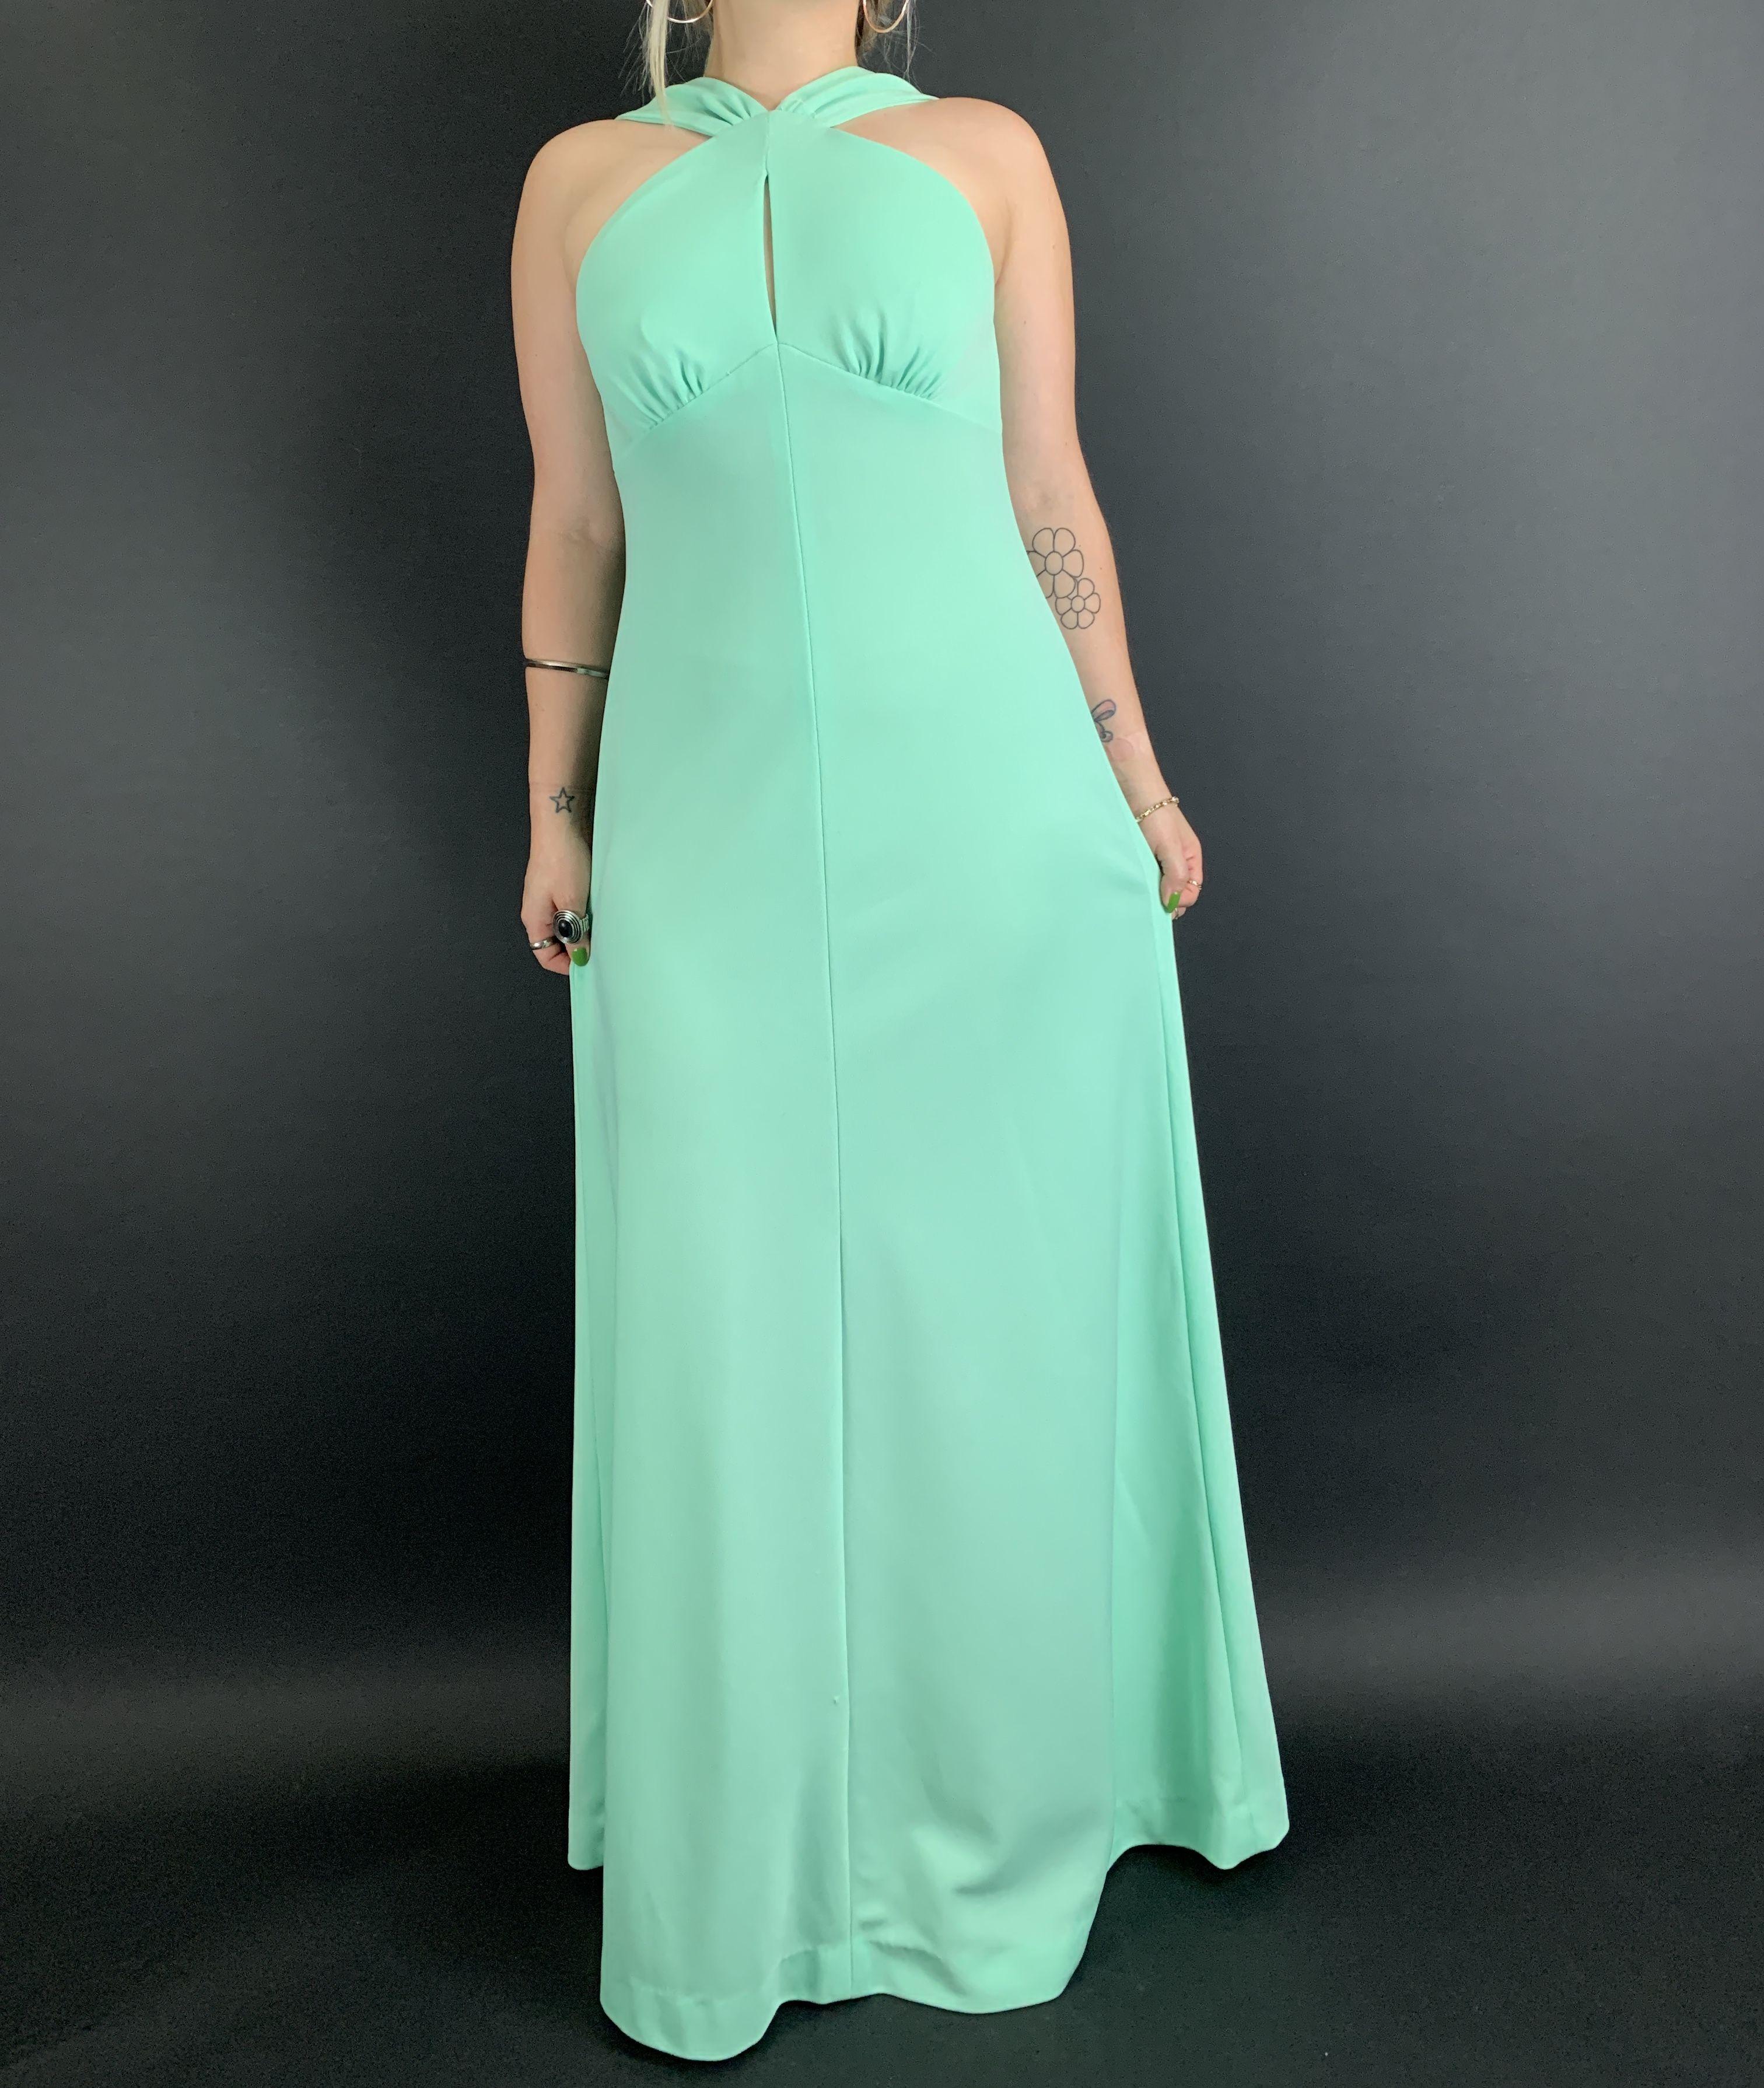 22++ Jcpenney green dress information